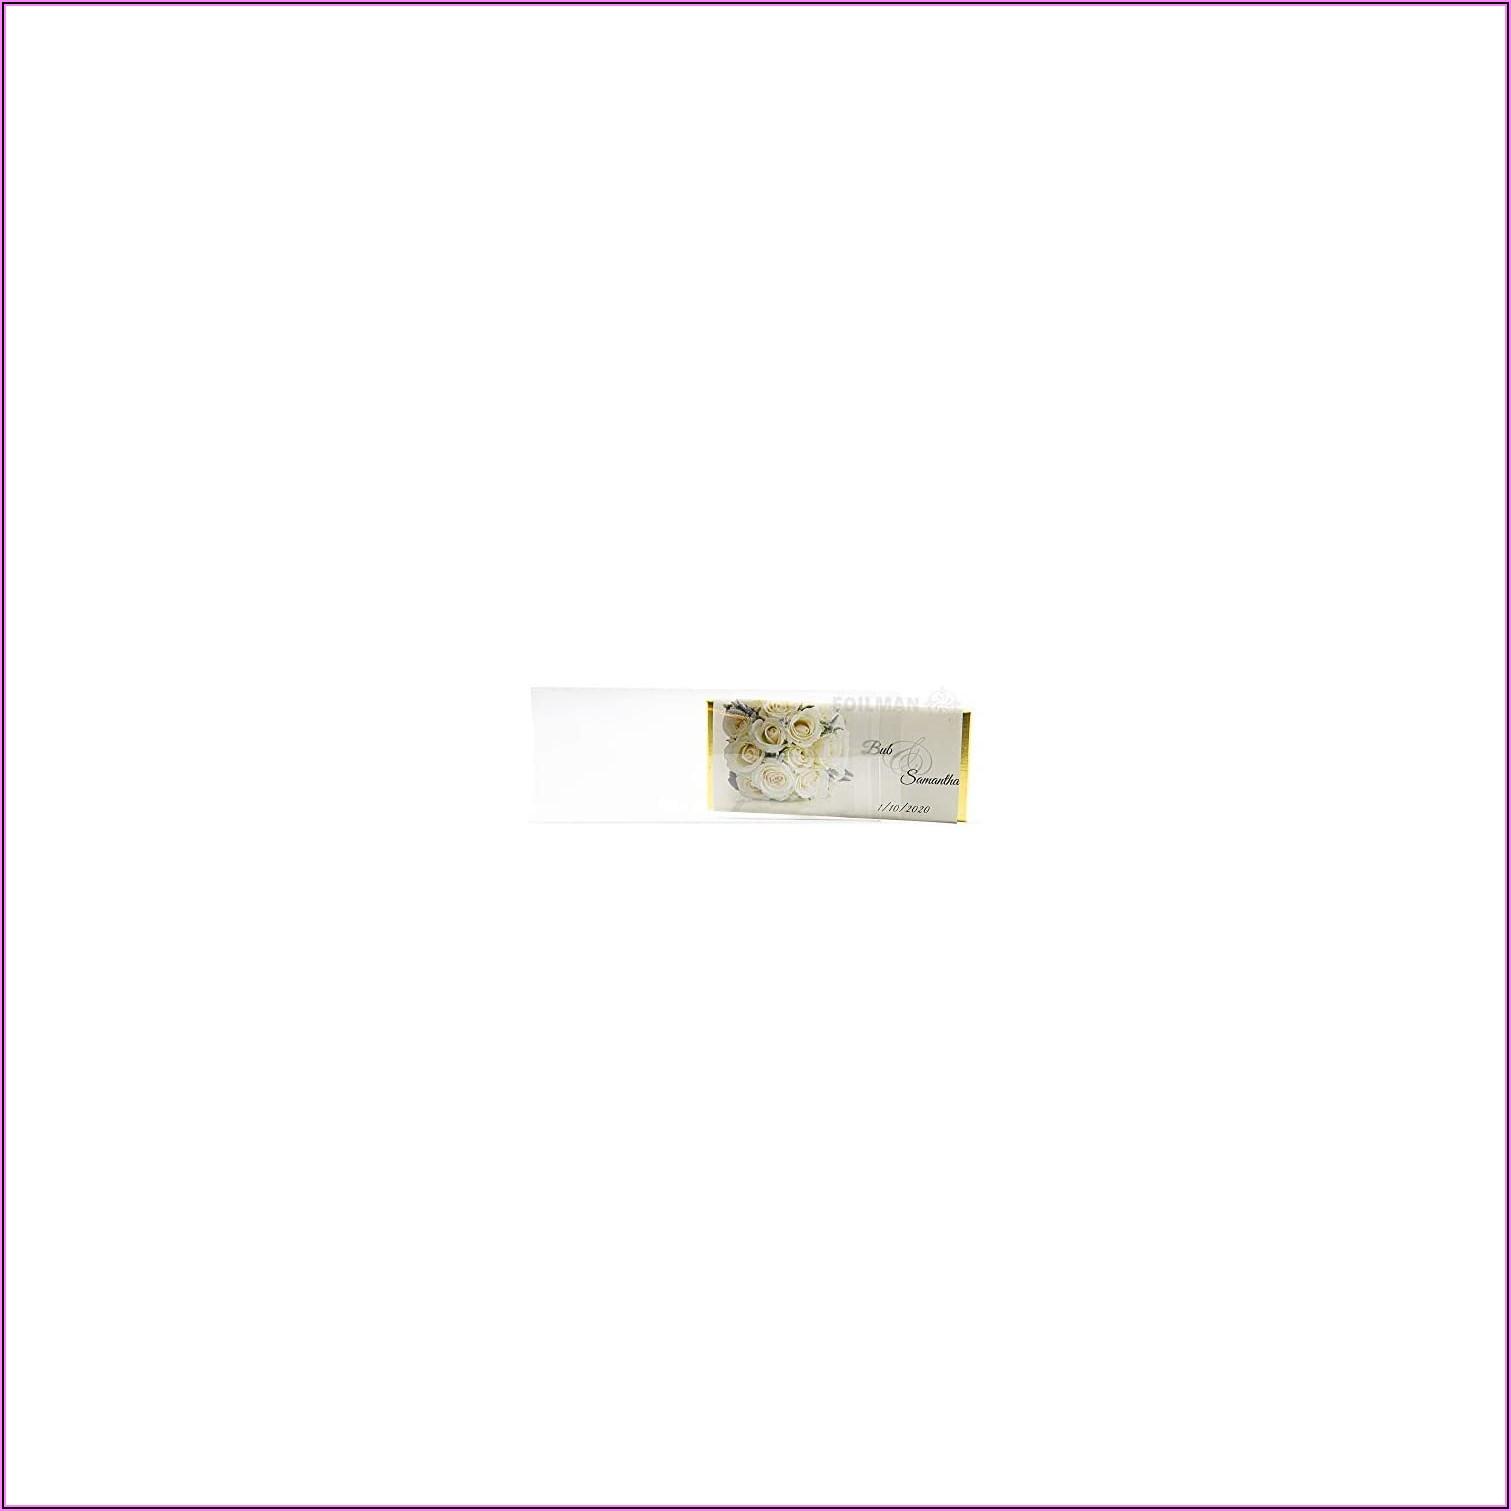 4 X 5 Clear Envelopes